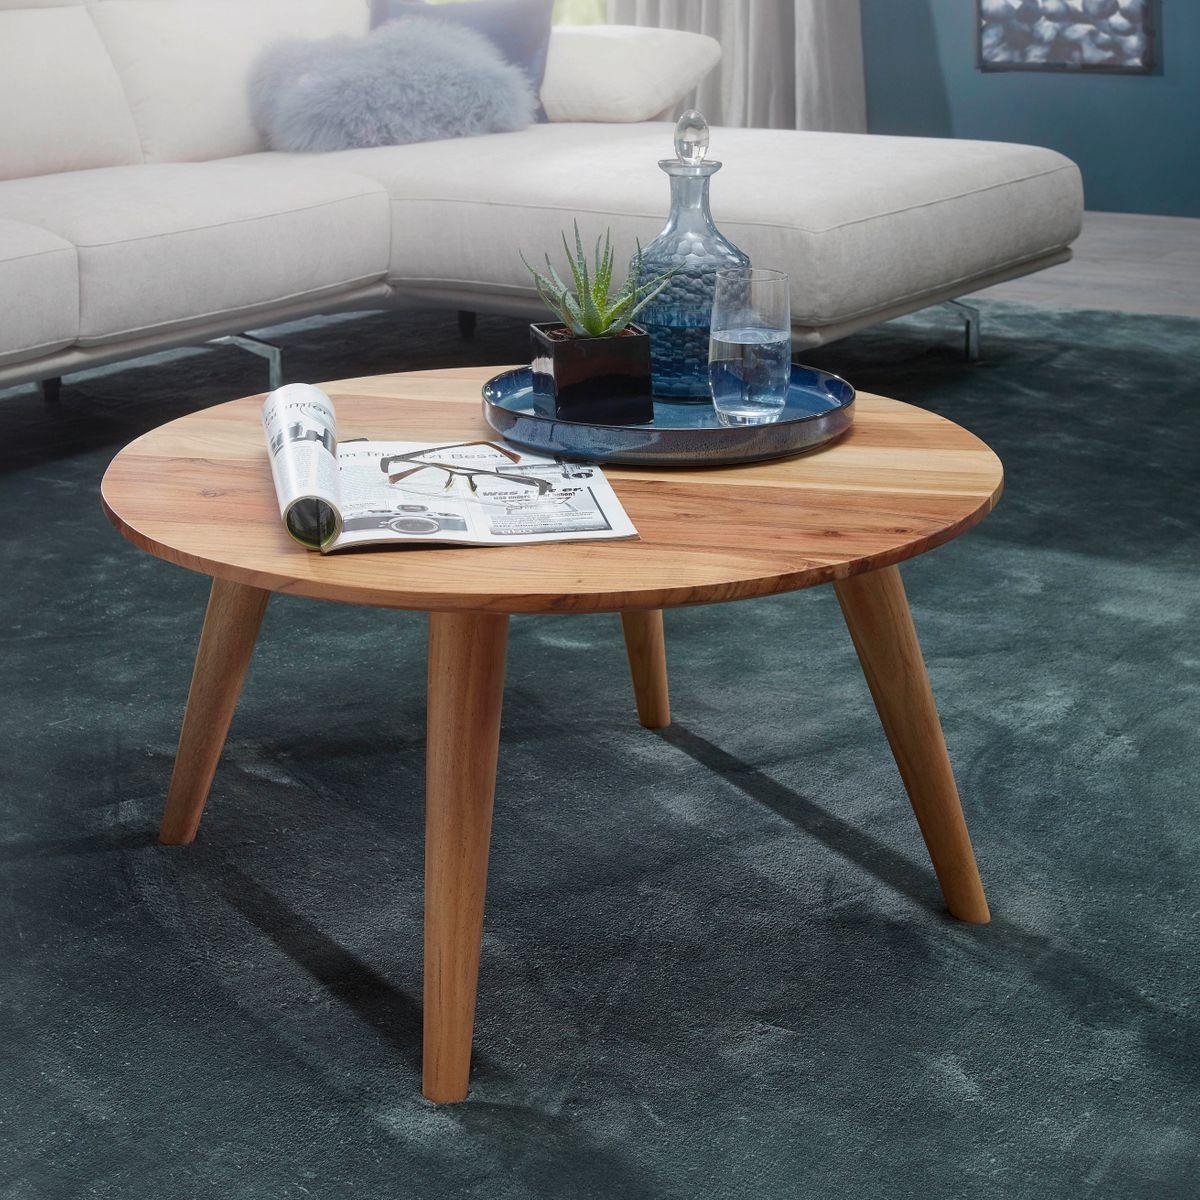 Finebuy Coffee Table Solid Wood Acacia Coffee Table Round 75 X 40 Cm Farmhouse Ebay